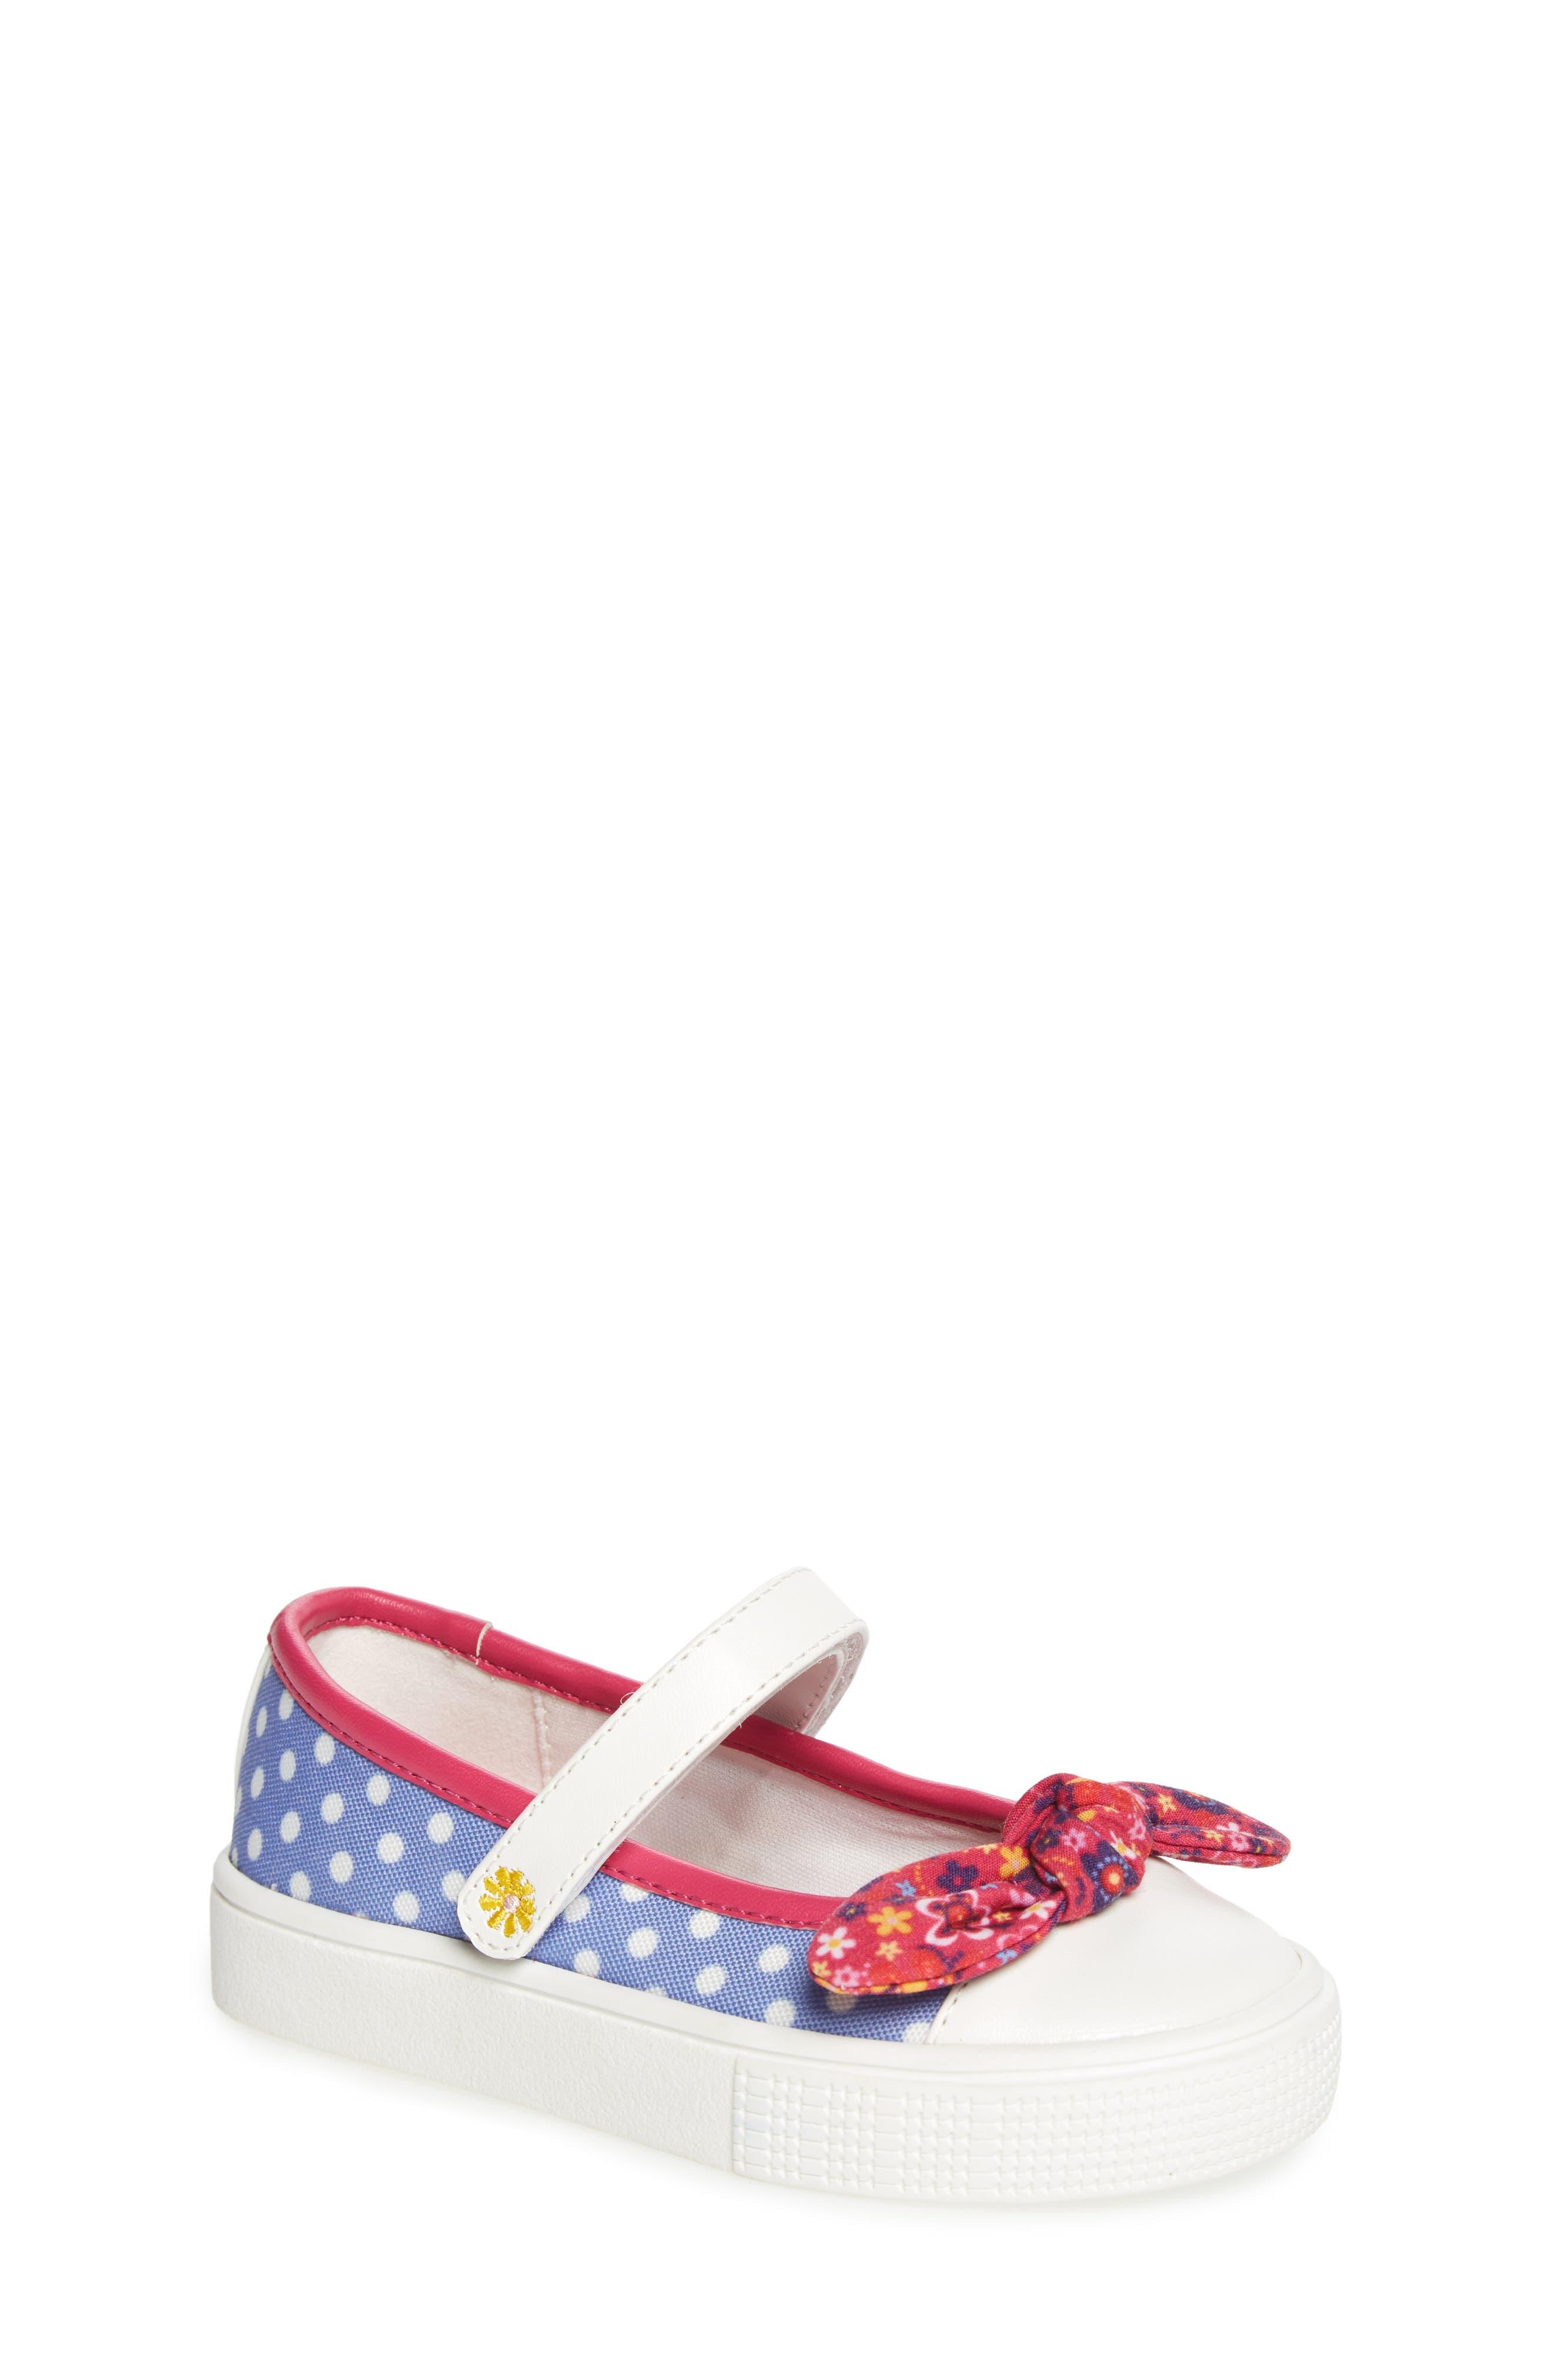 Kendall Mary Jane Sneaker,                             Main thumbnail 1, color,                             Purple